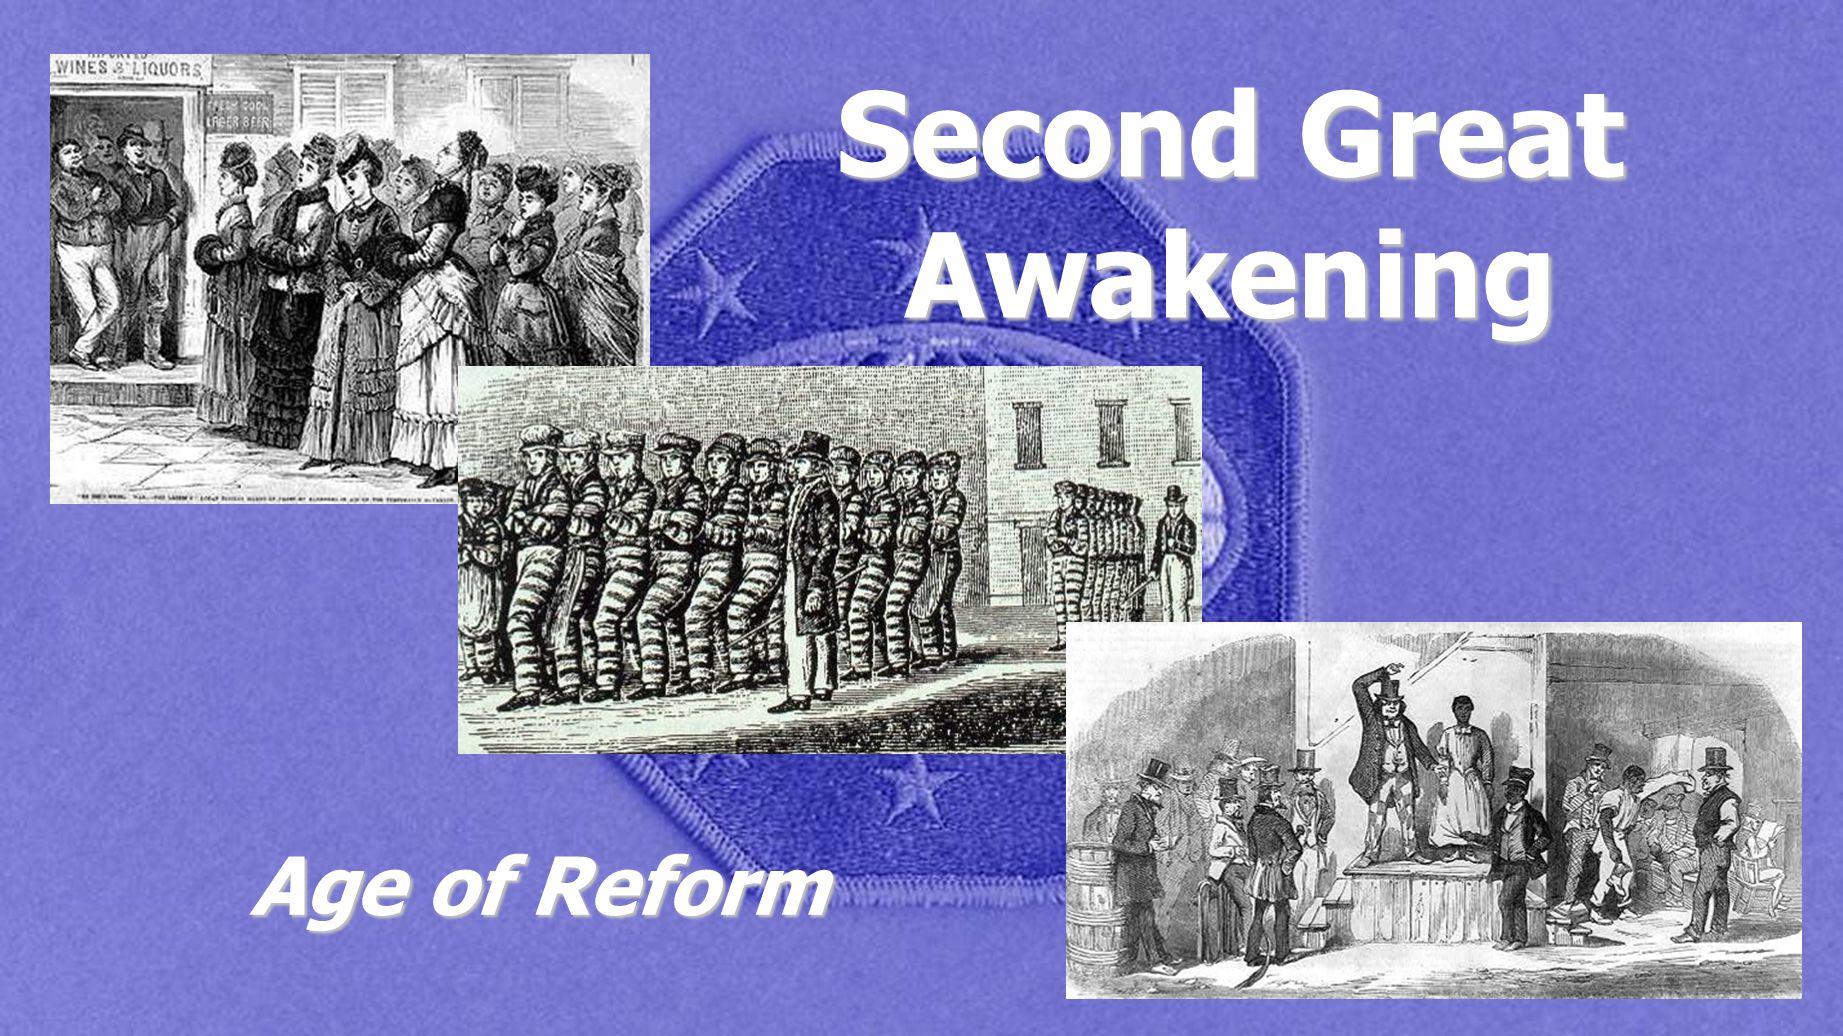 Second Great Awakening Age of Reform